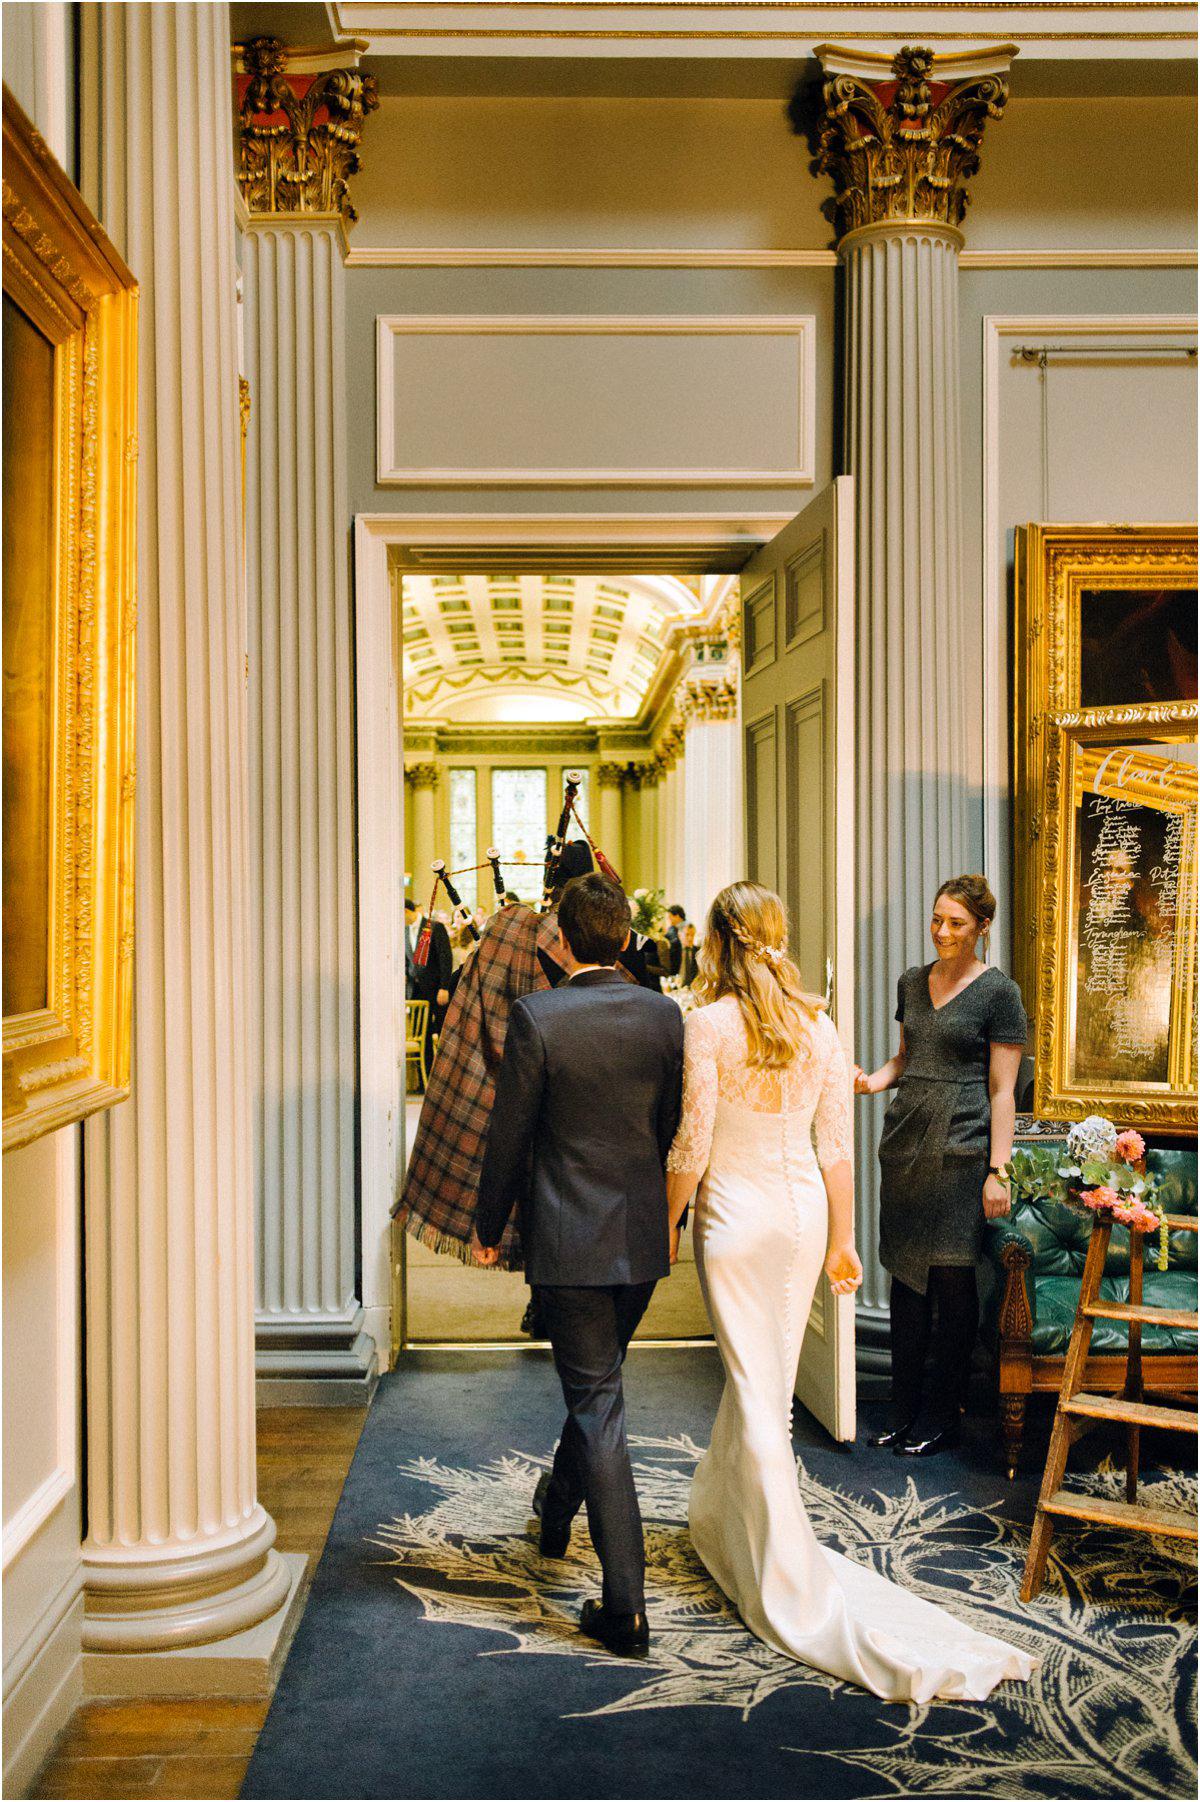 Crofts & Kowalczyk Best Wedding Photography Scotland Blogpost-88.jpg